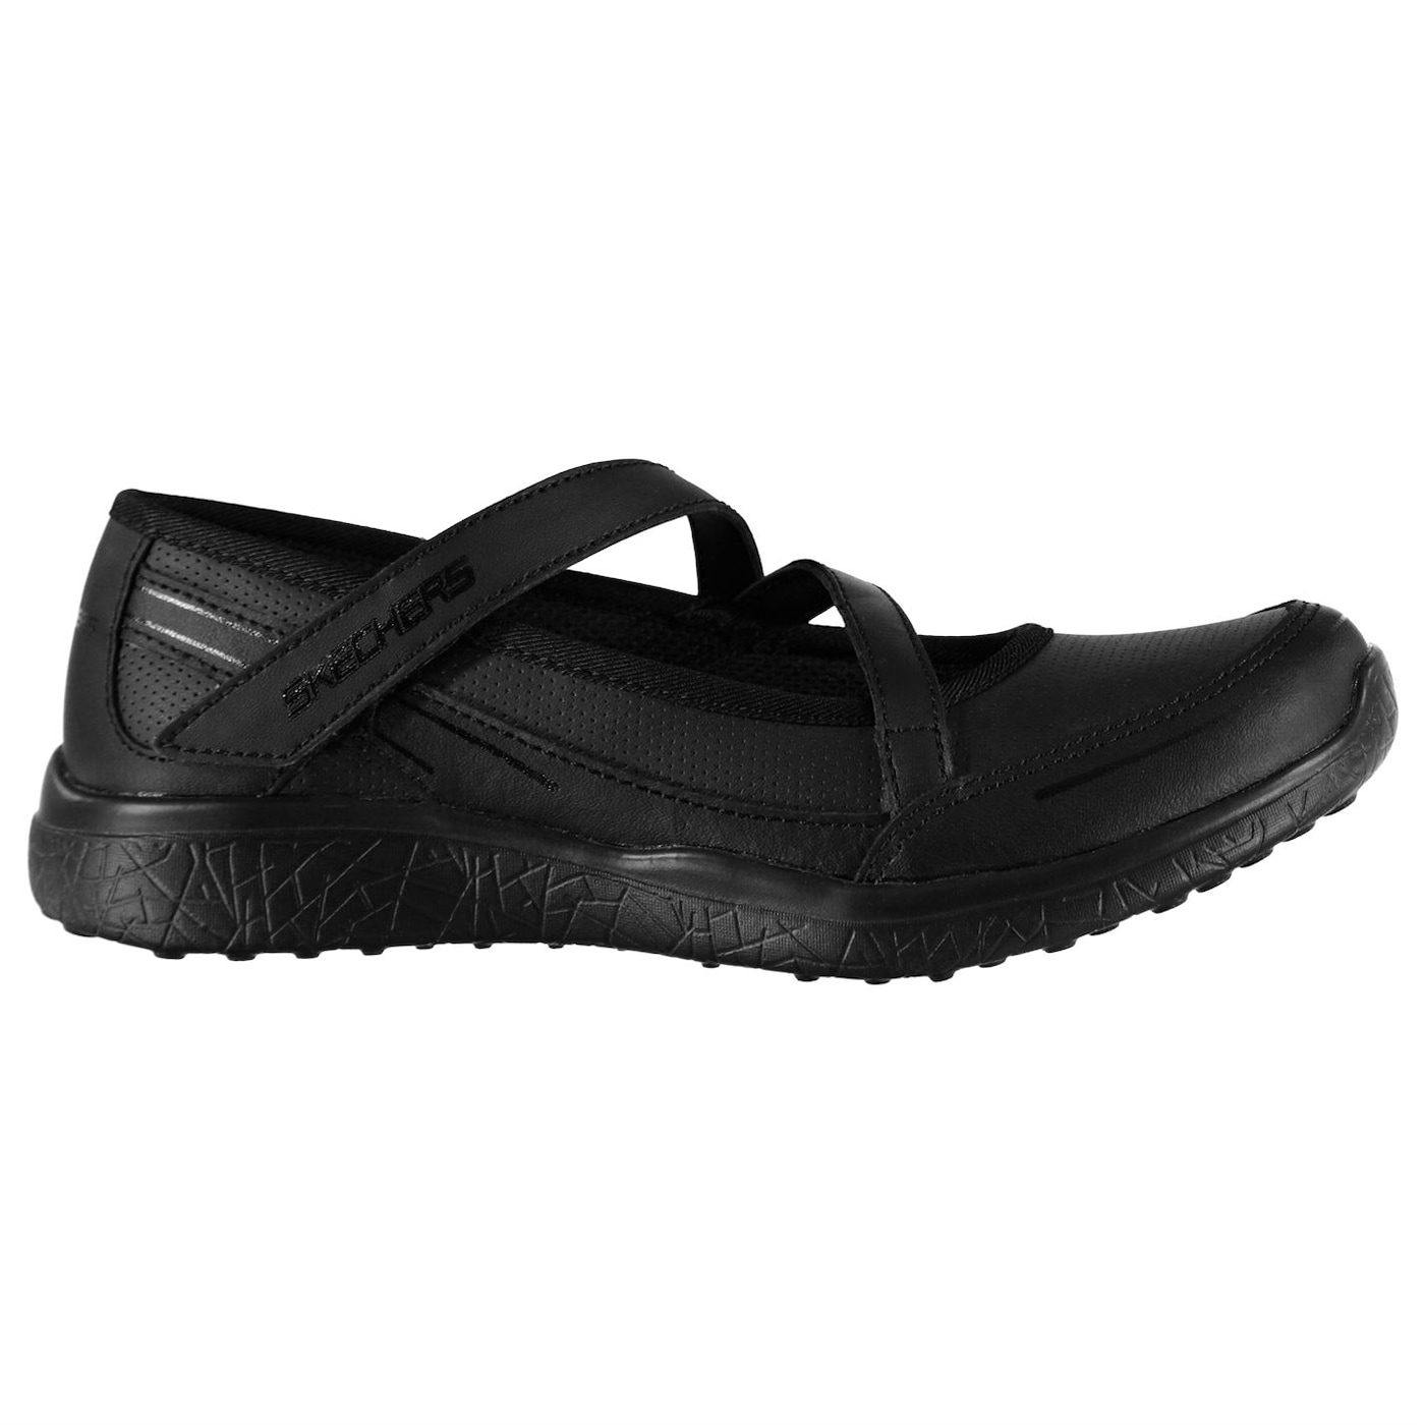 Skechers Micro Burst Child Girls Shoes